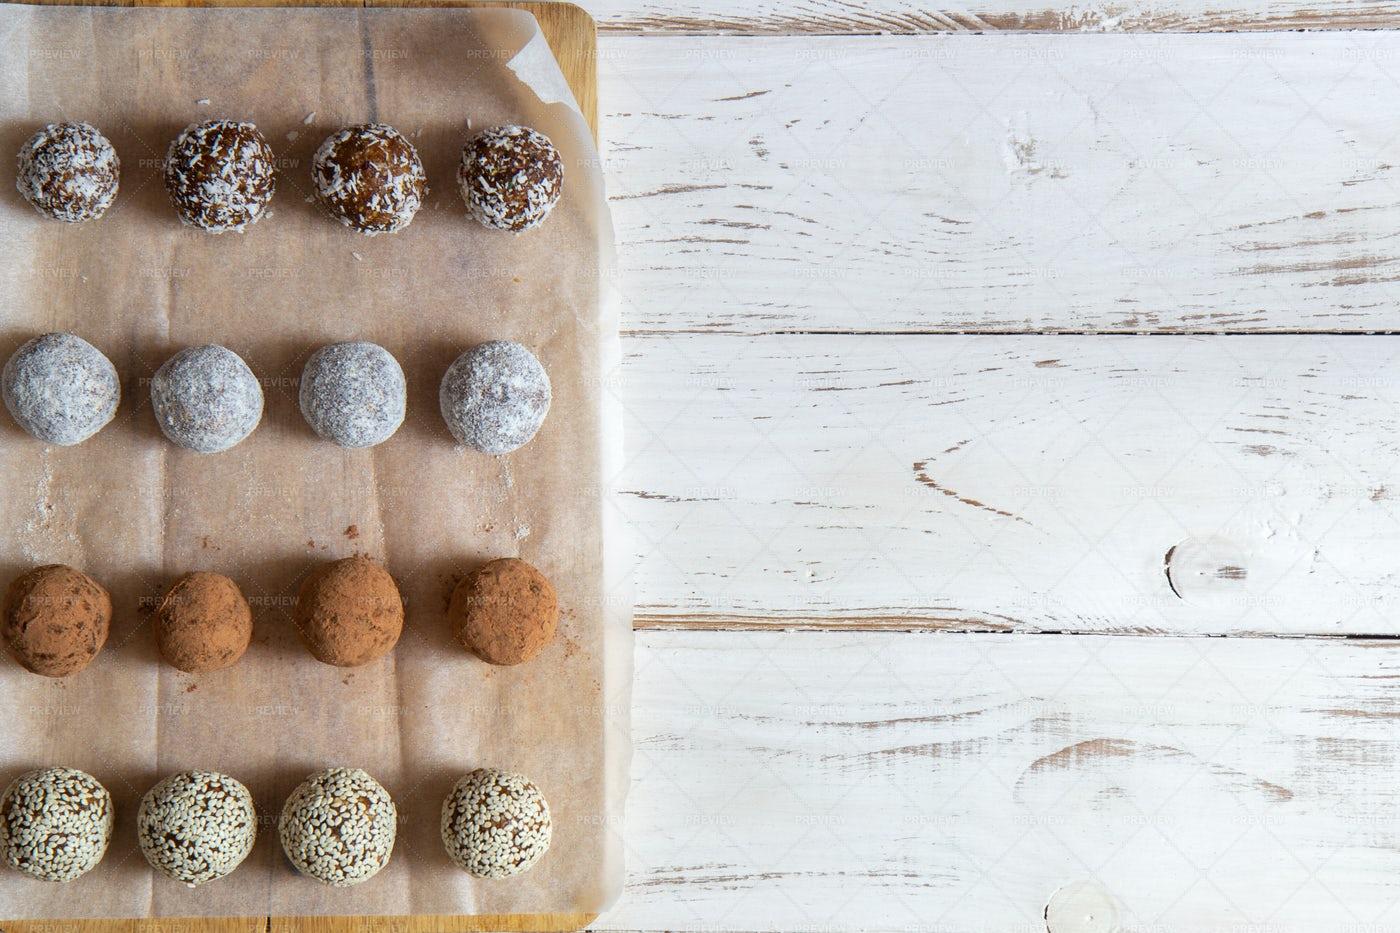 Prepared Snack Balls: Stock Photos